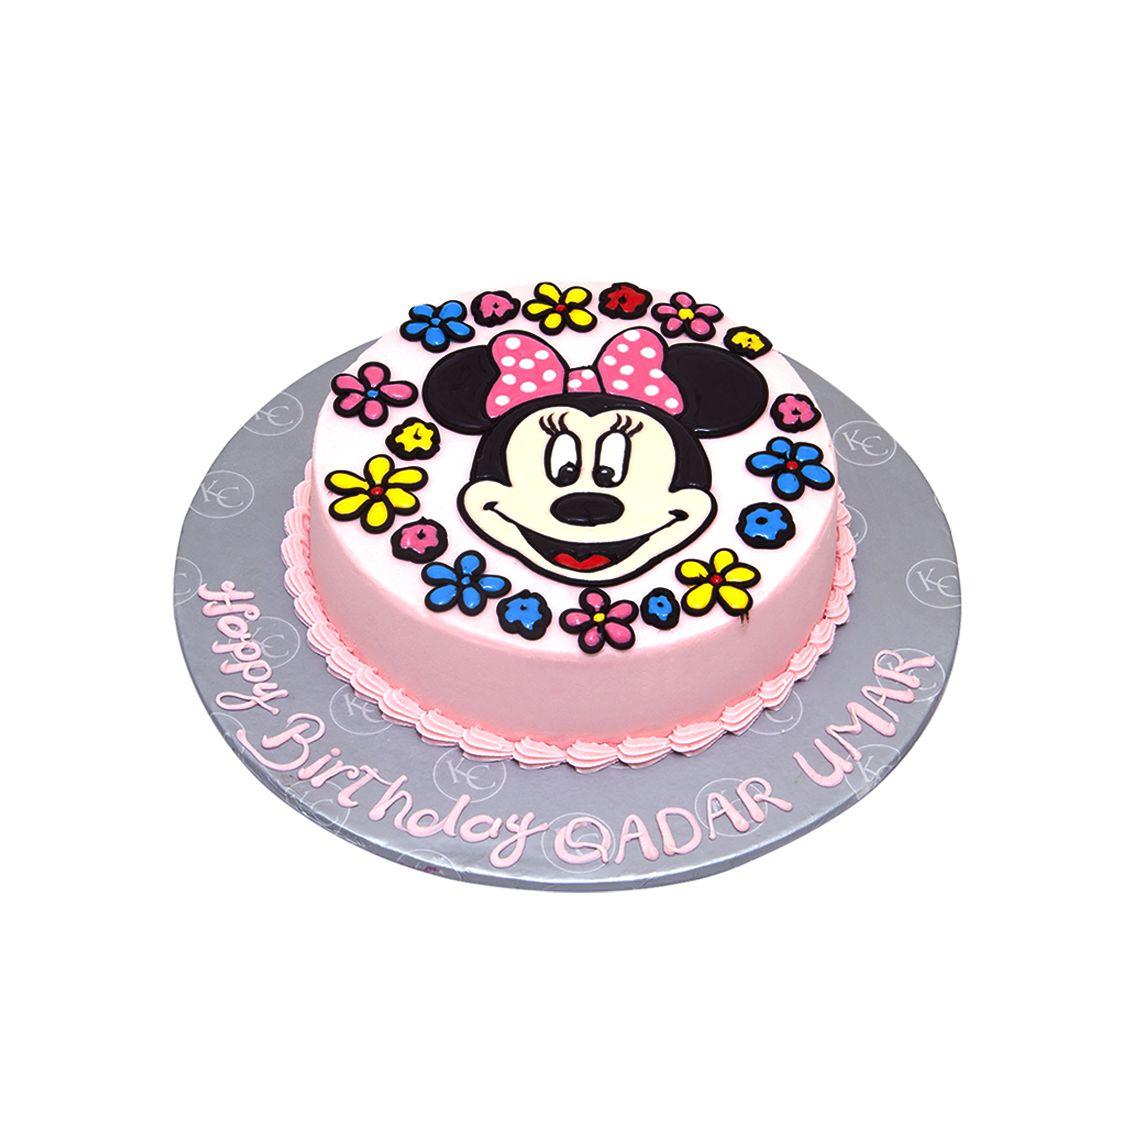 Kitchen Cuisine Default Category Minnie Mouse Face Cake